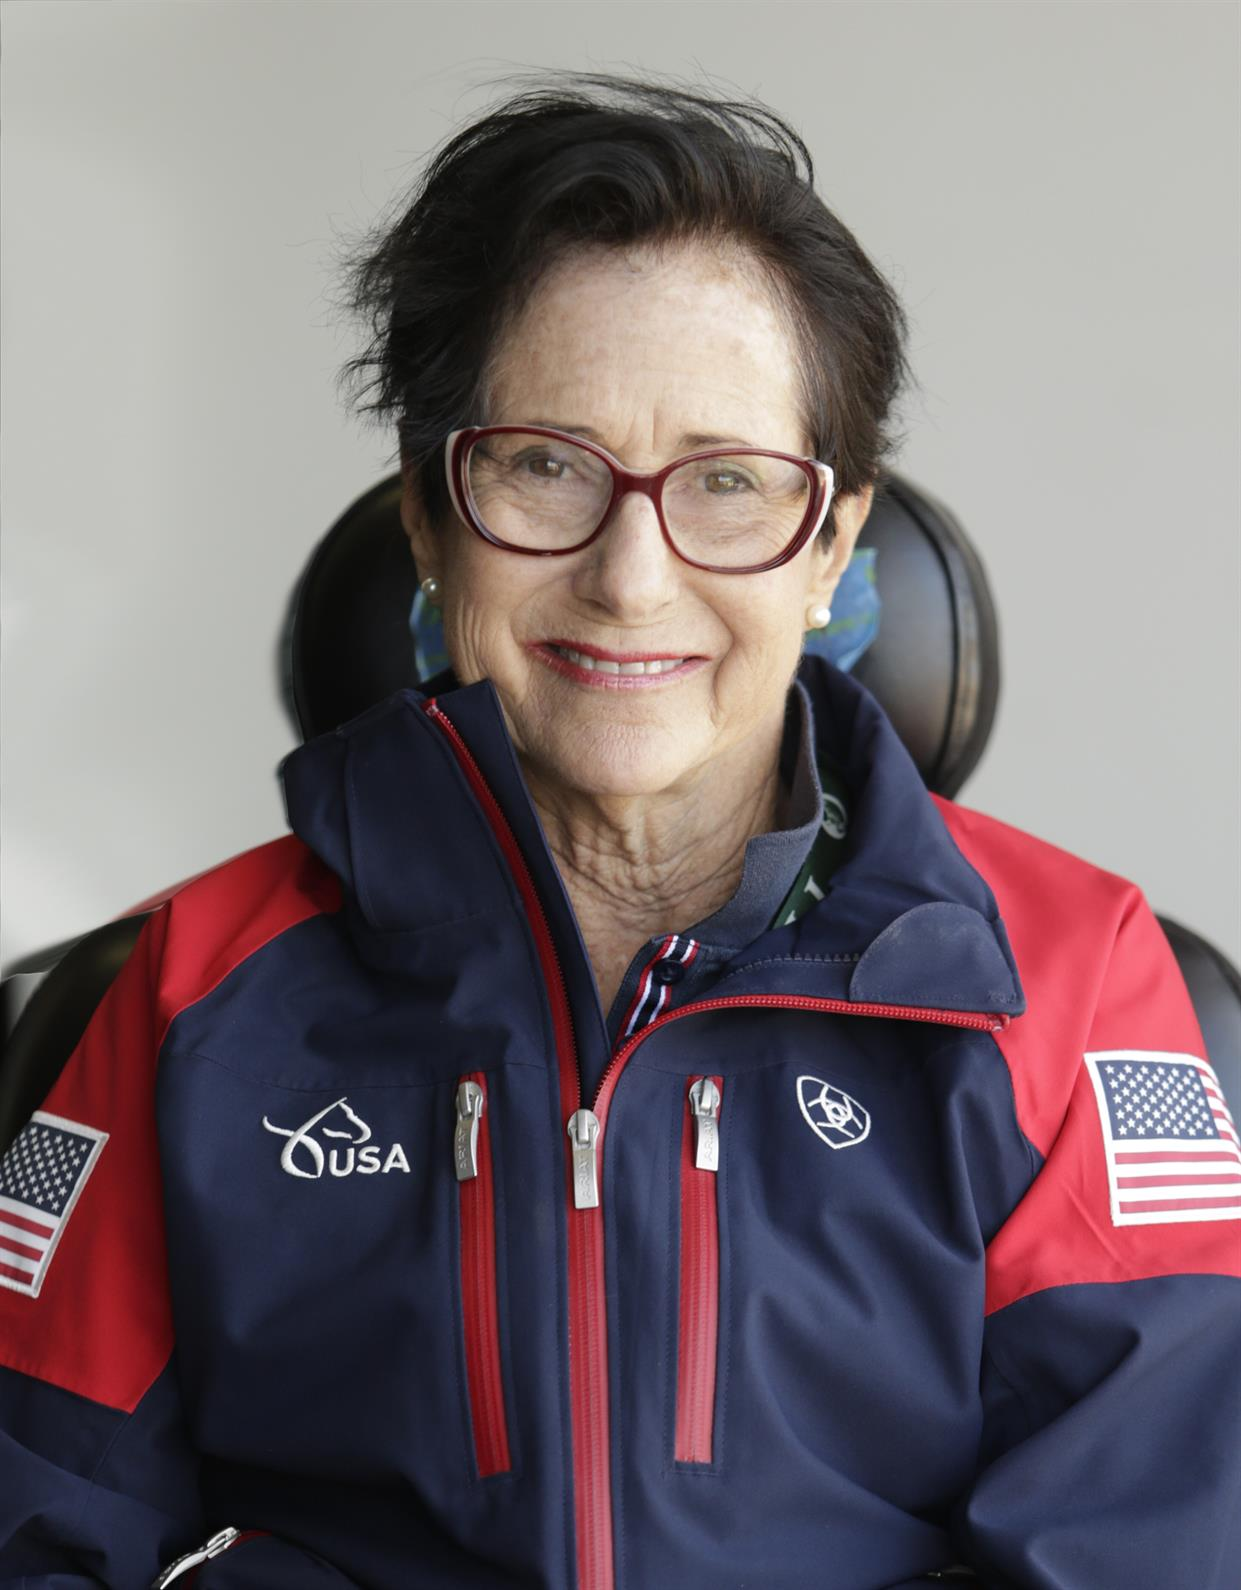 Deborah Stanitski